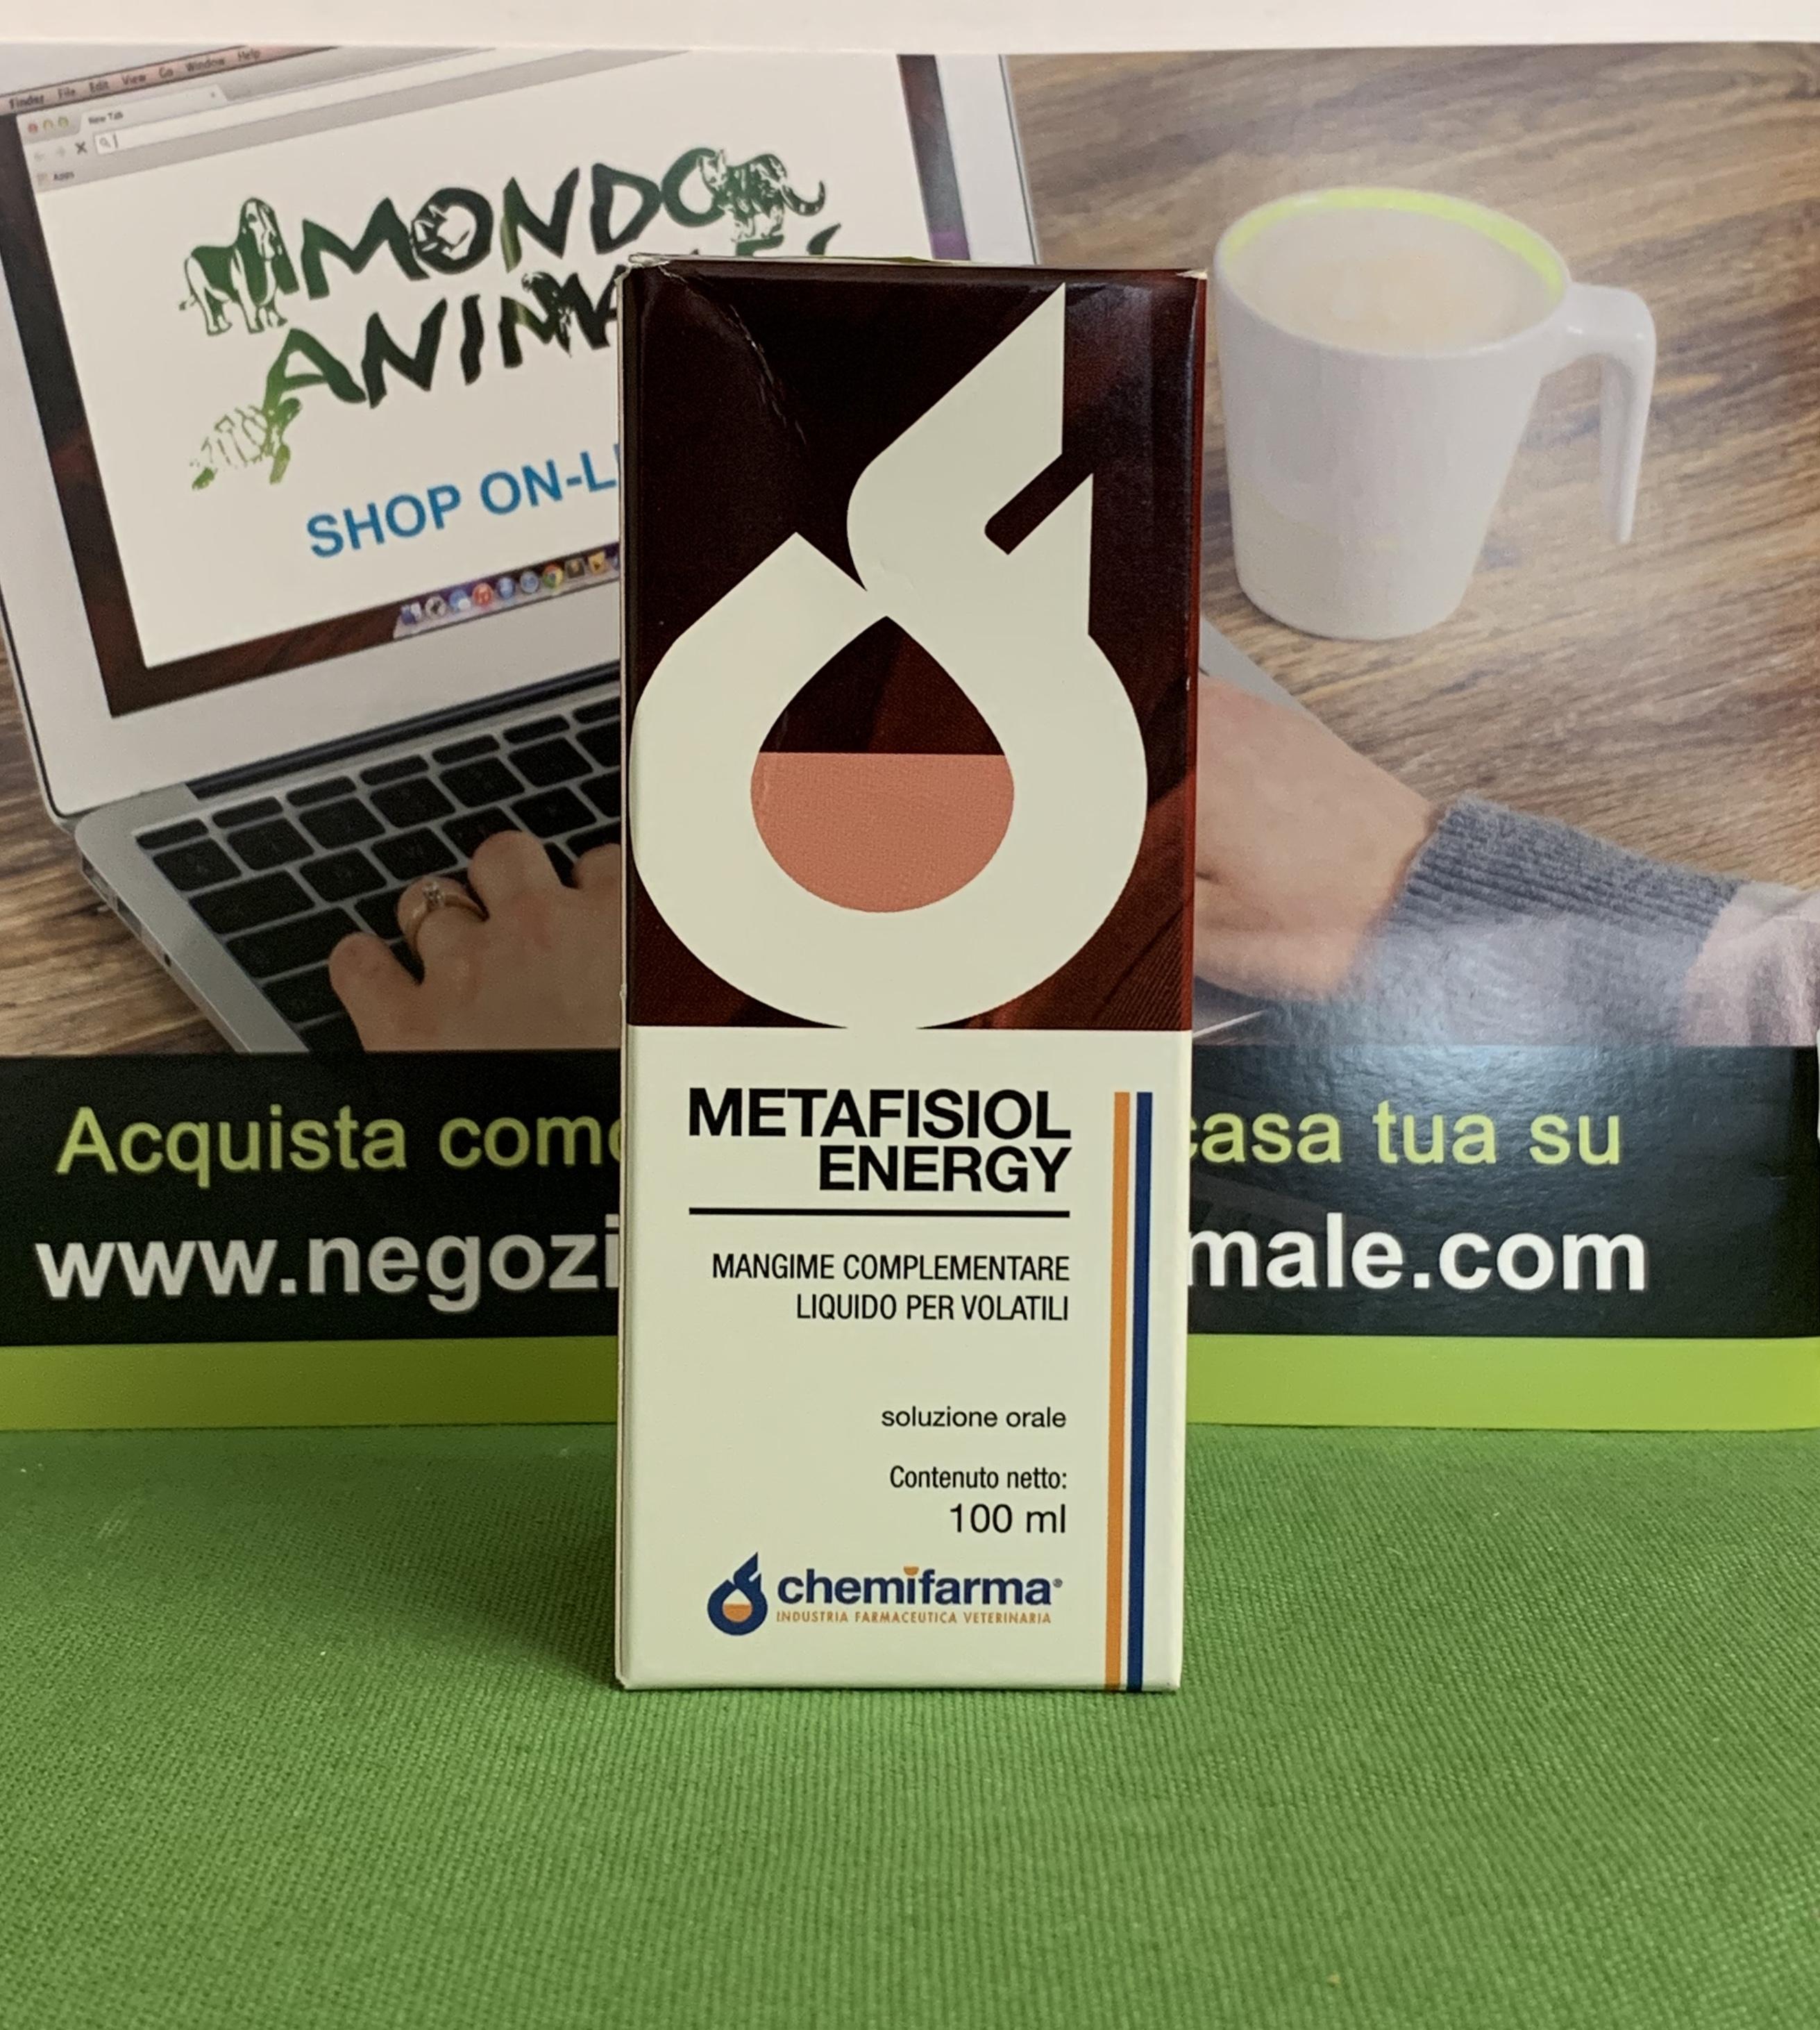 METAFISIOL ENERGY